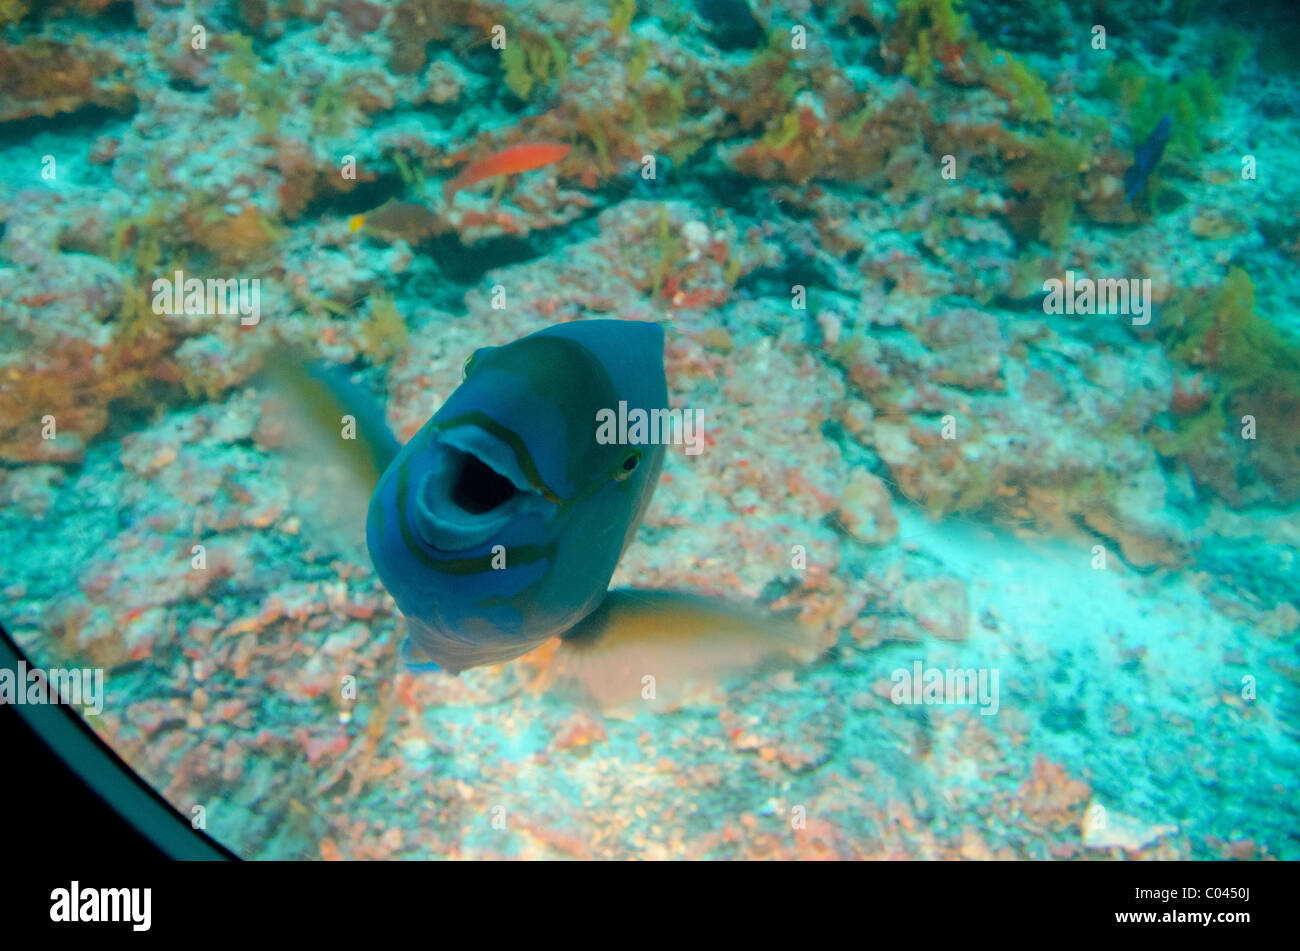 Maldives, North Male Atoll, near the island of Male. Tourist submarine, underwater fish view from sub window. Stock Photo